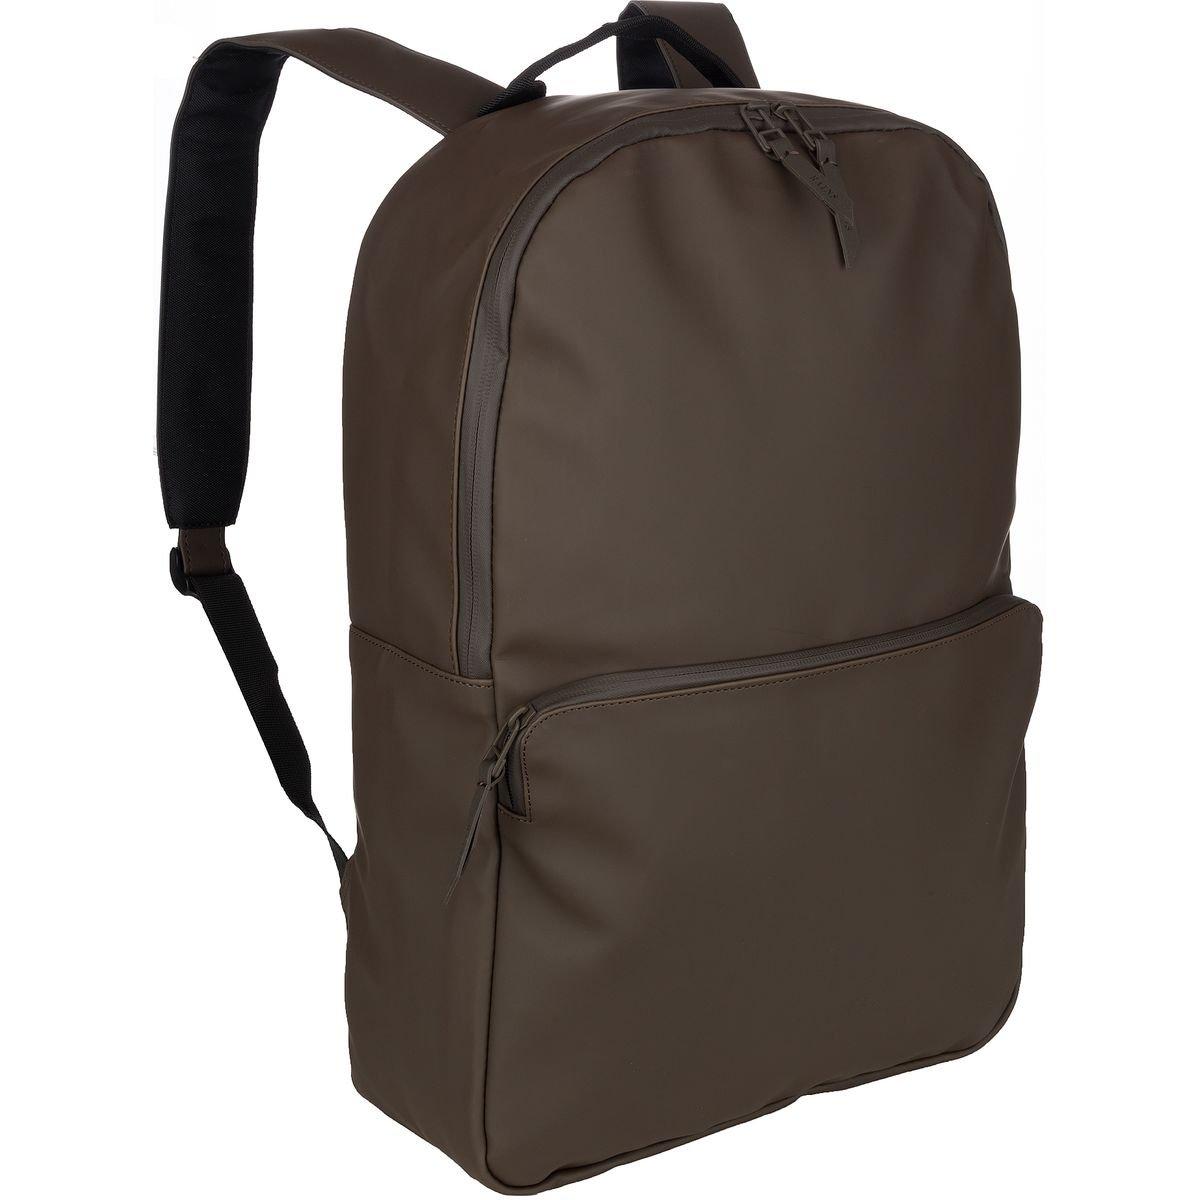 Rains Field Bag Purse Brown, One Size